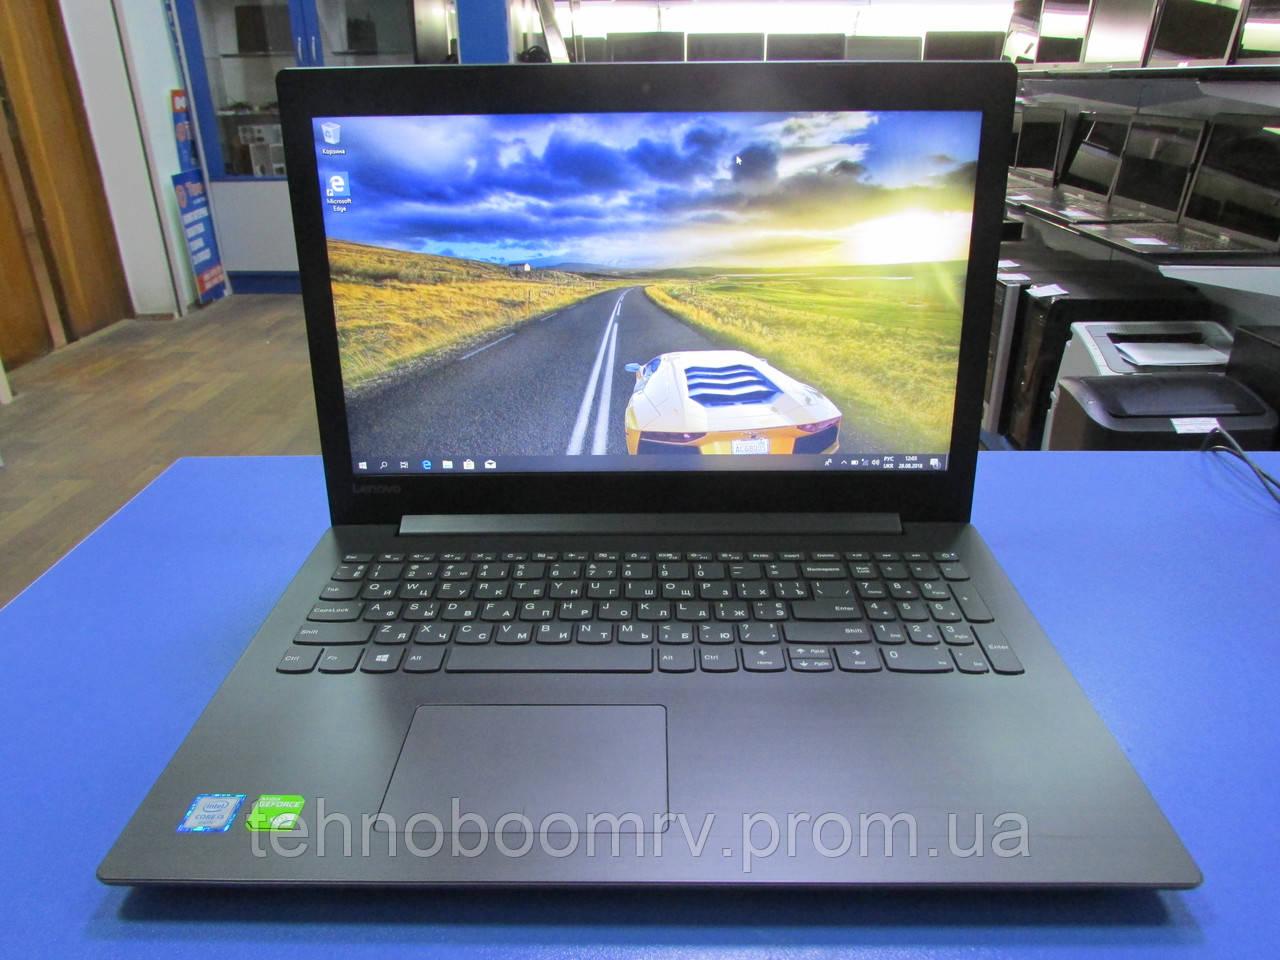 Ноутбук Lenovo 320 15.6